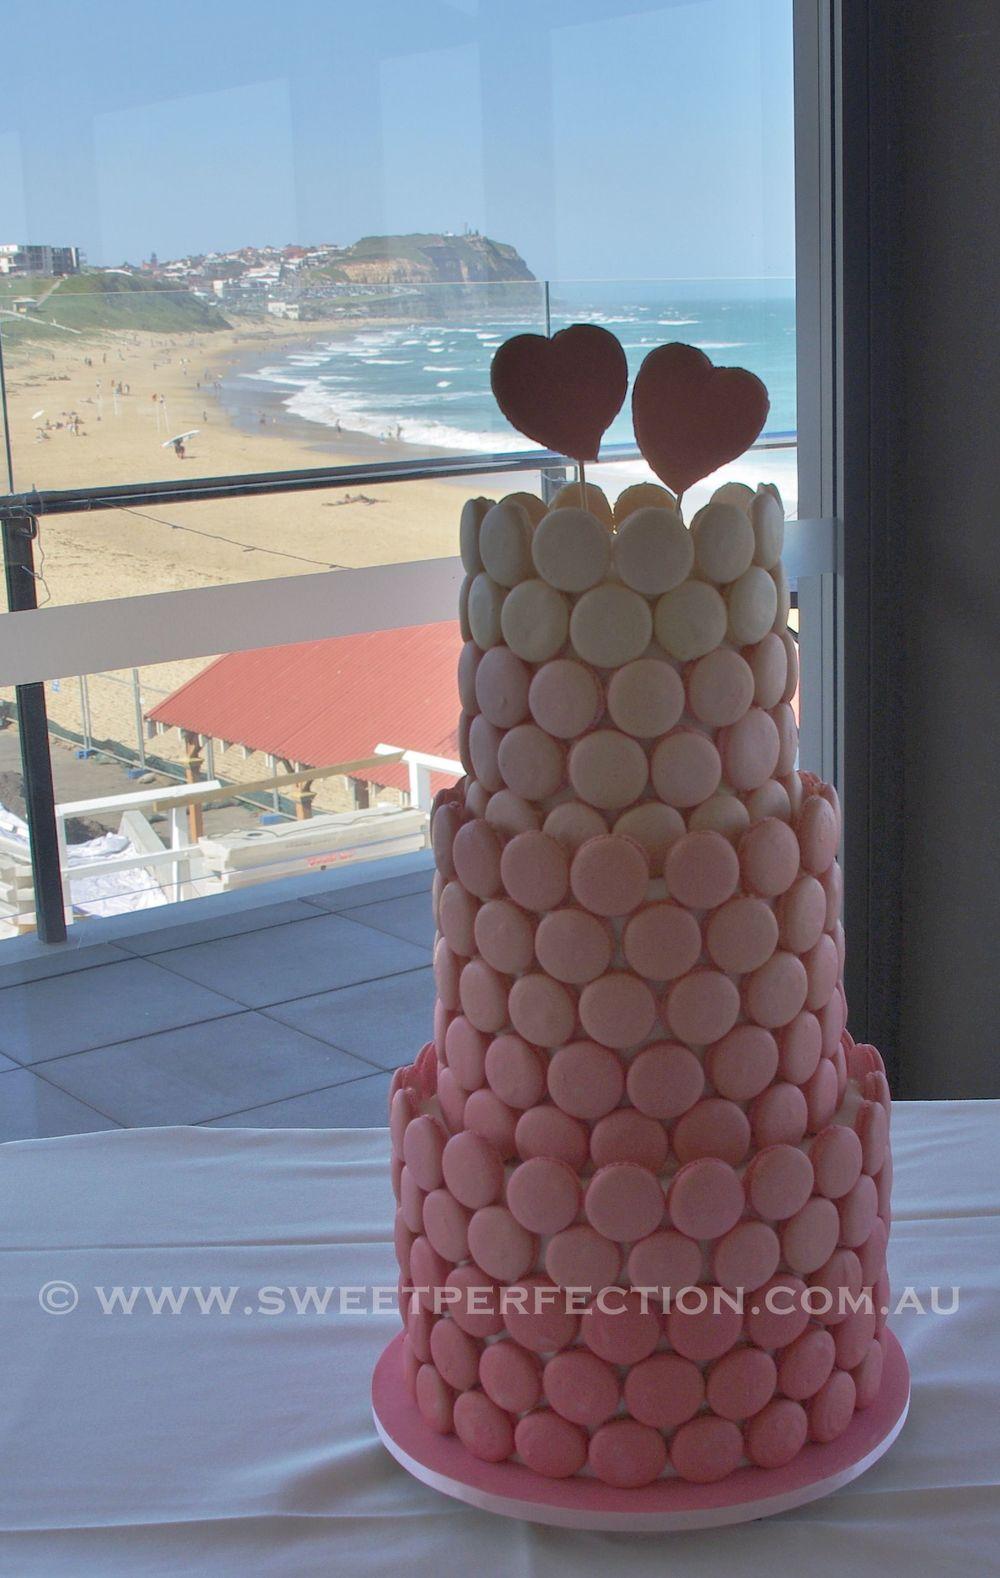 Beautiful weddings cakes in the beautiful city of Newcastle.